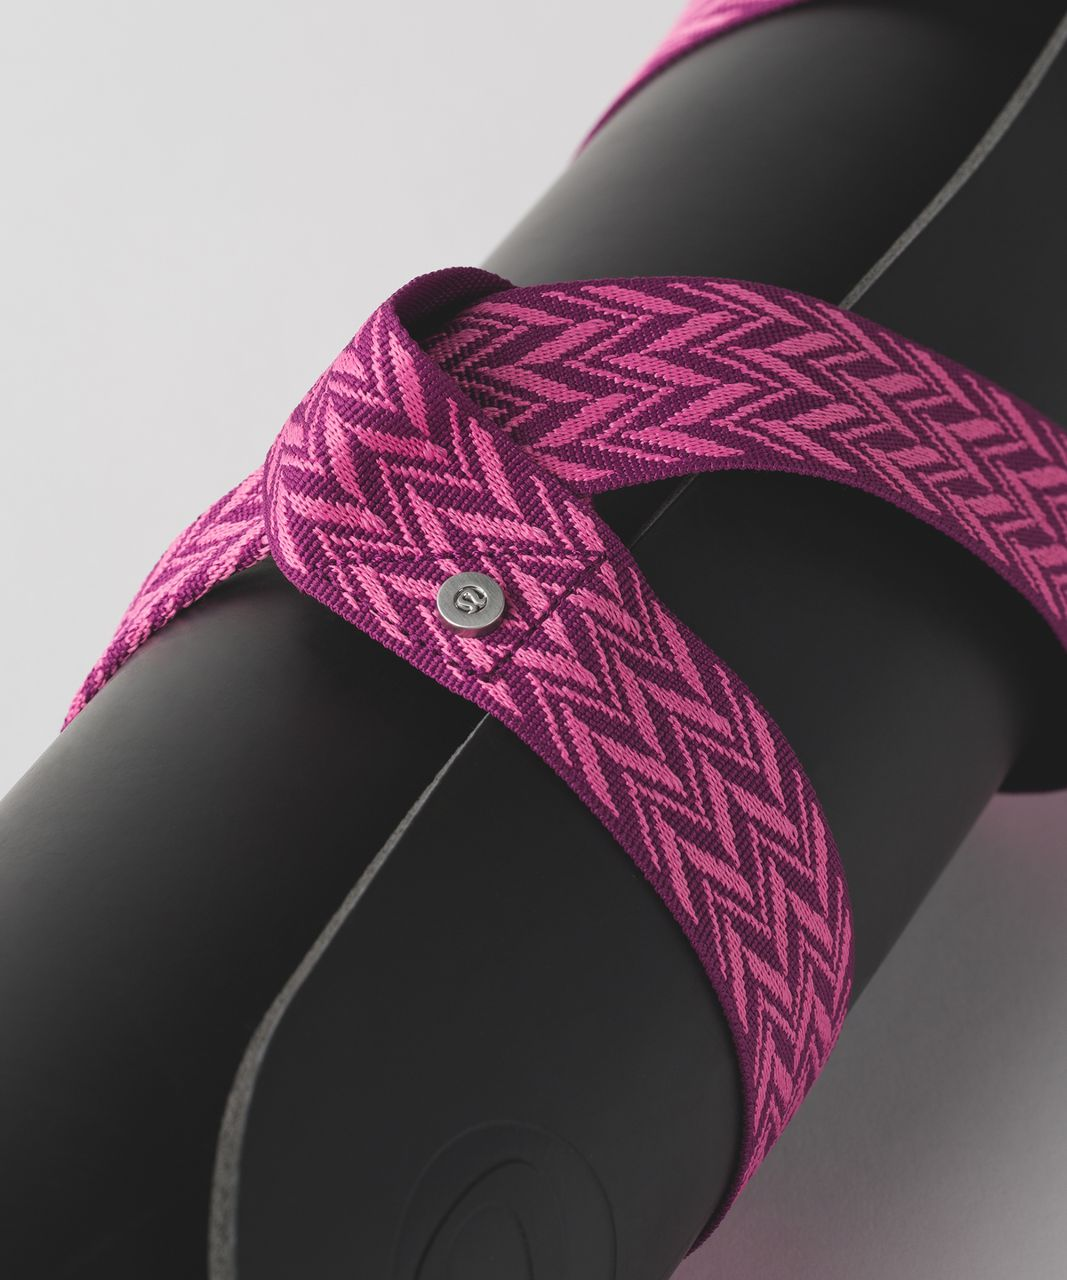 Lululemon Loop It Up Mat Strap - Regal Plum / Pink Paradise